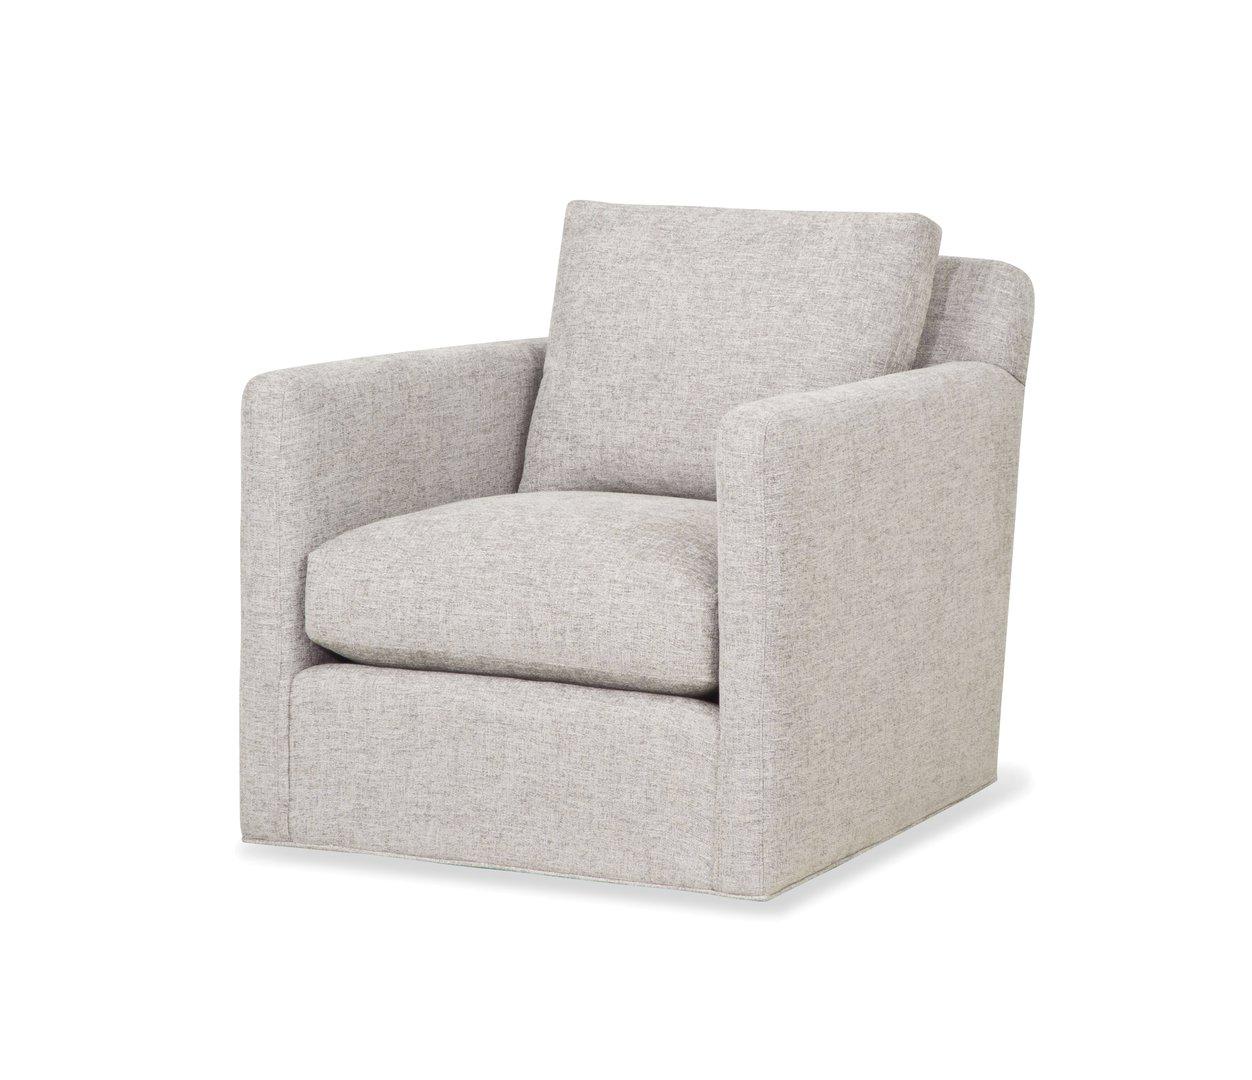 Coffey Swivel Glider Chair Image